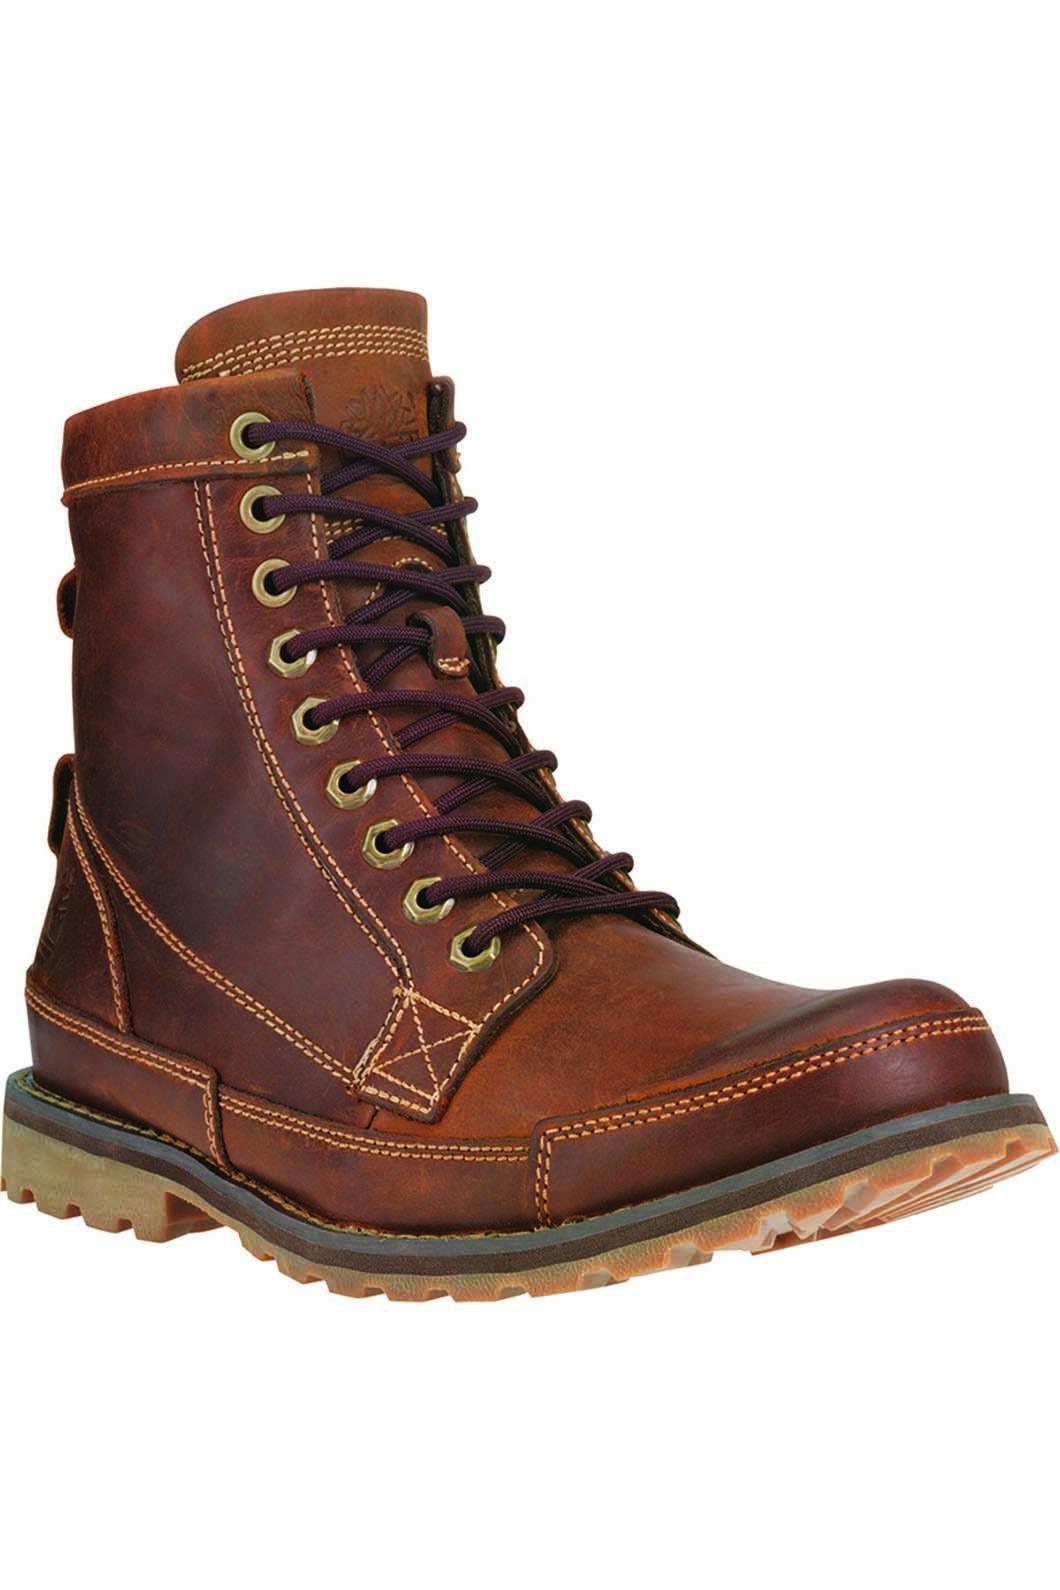 Timberland Men's Earthkeepers Original 6 Inch Boot, MEDIUM BROWN NUBUCK, hi-res